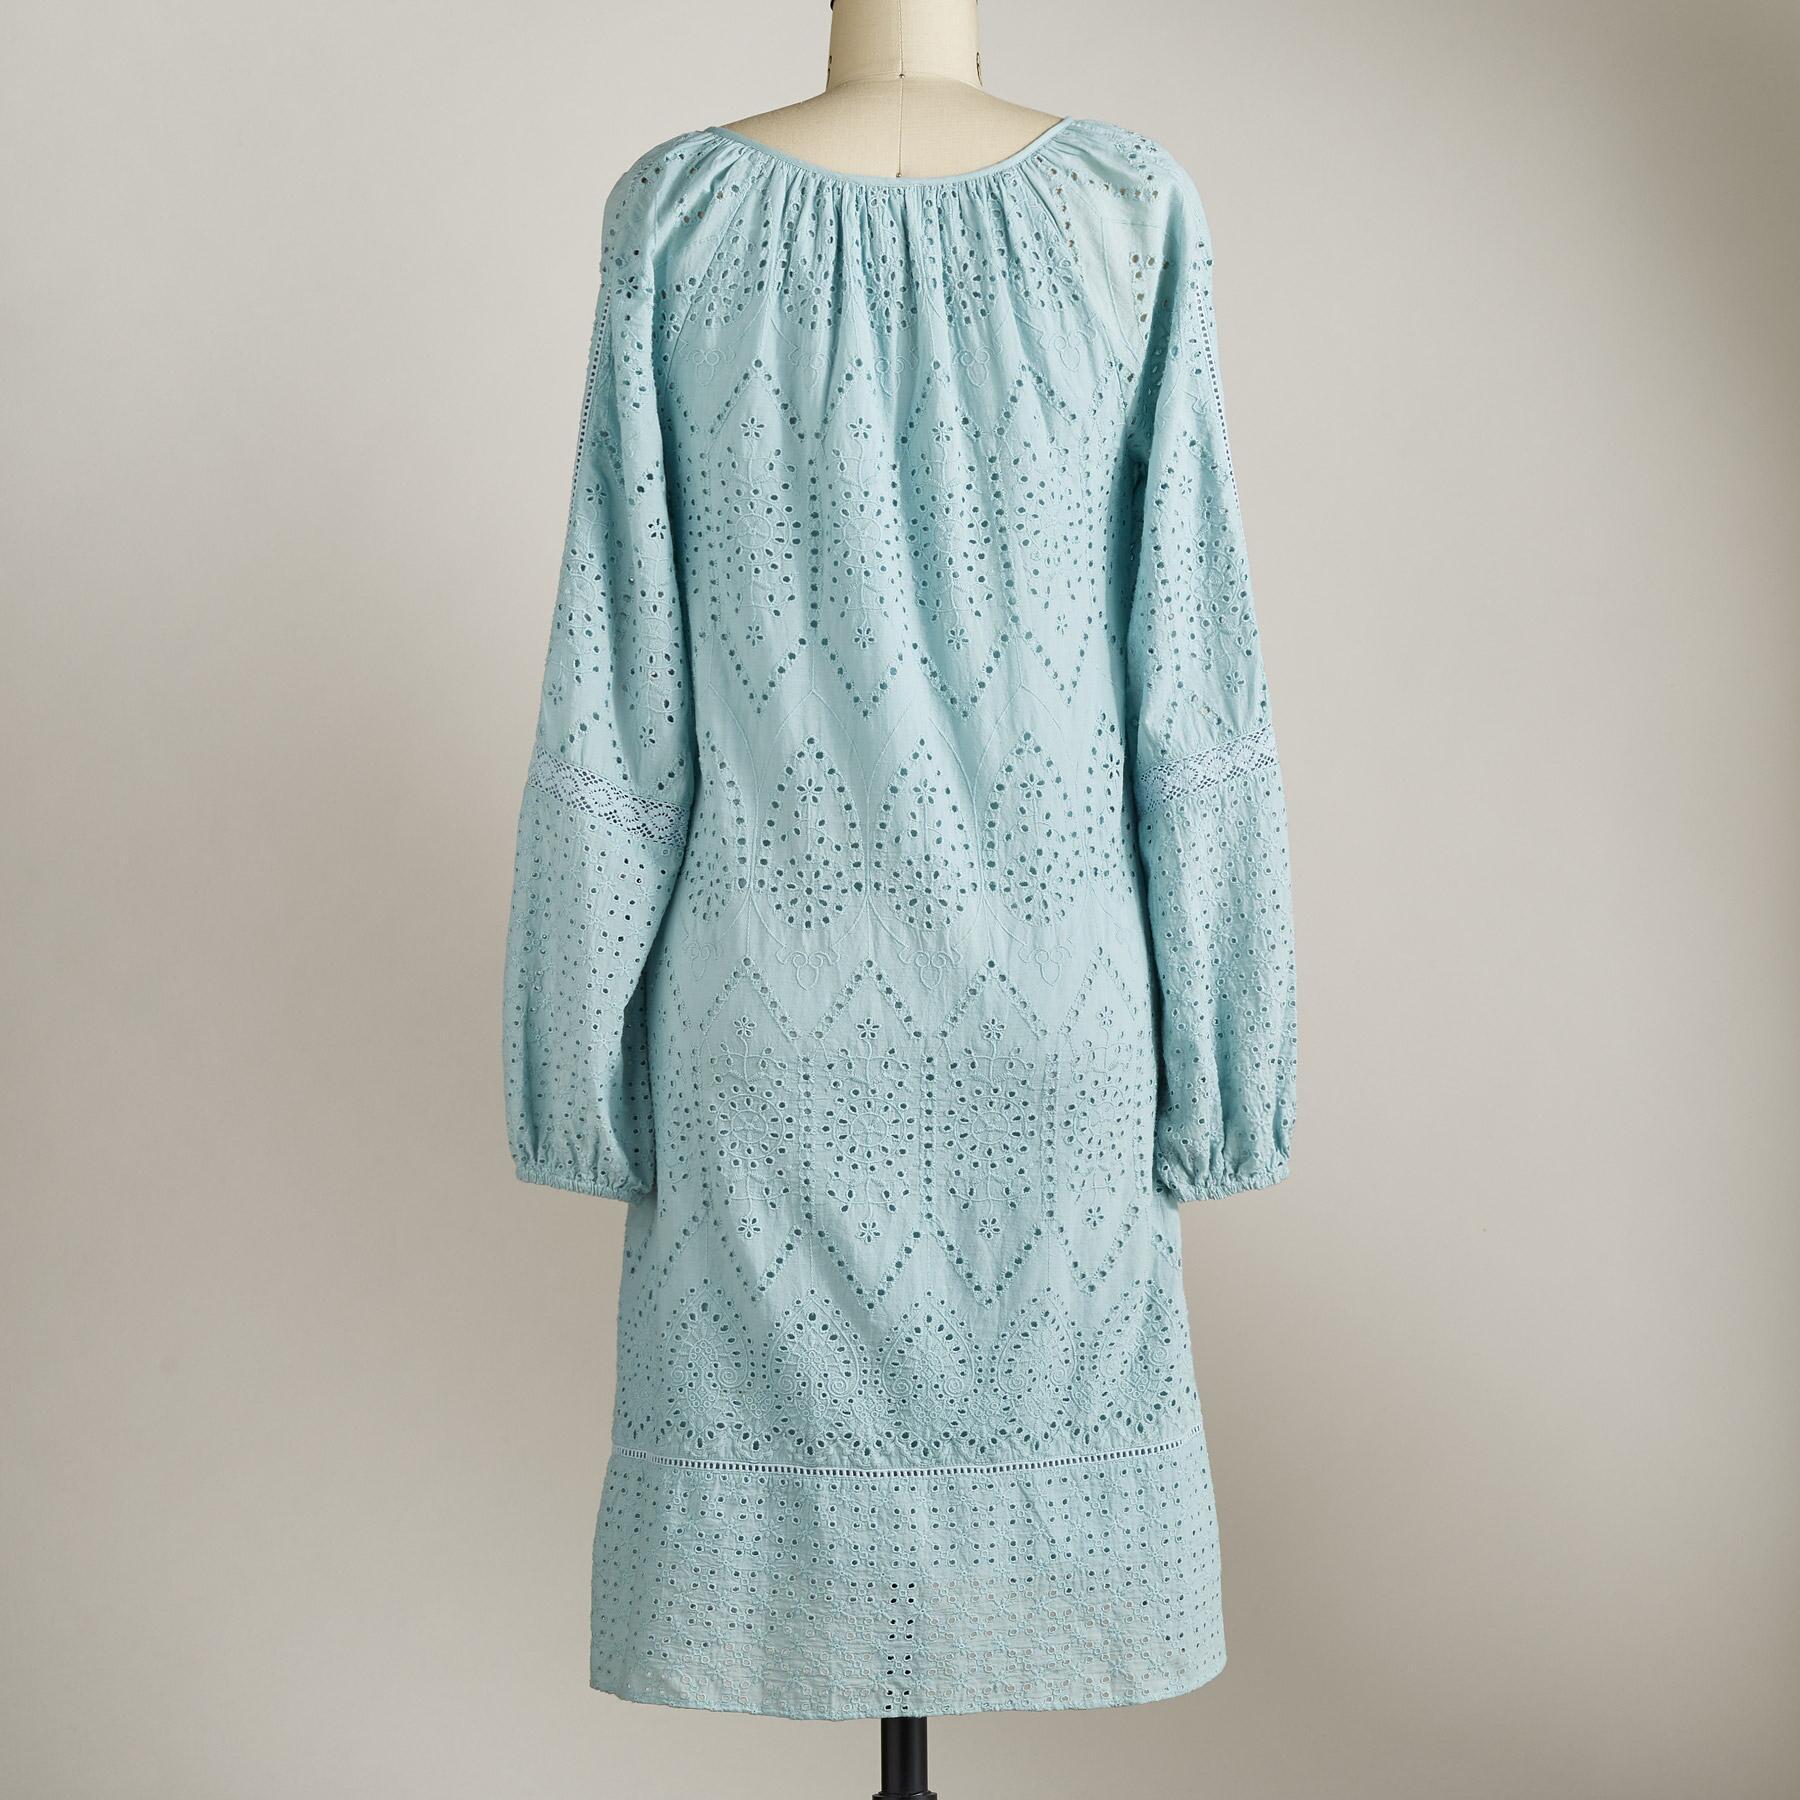 COASTLAND DRESS - PETITES: View 3